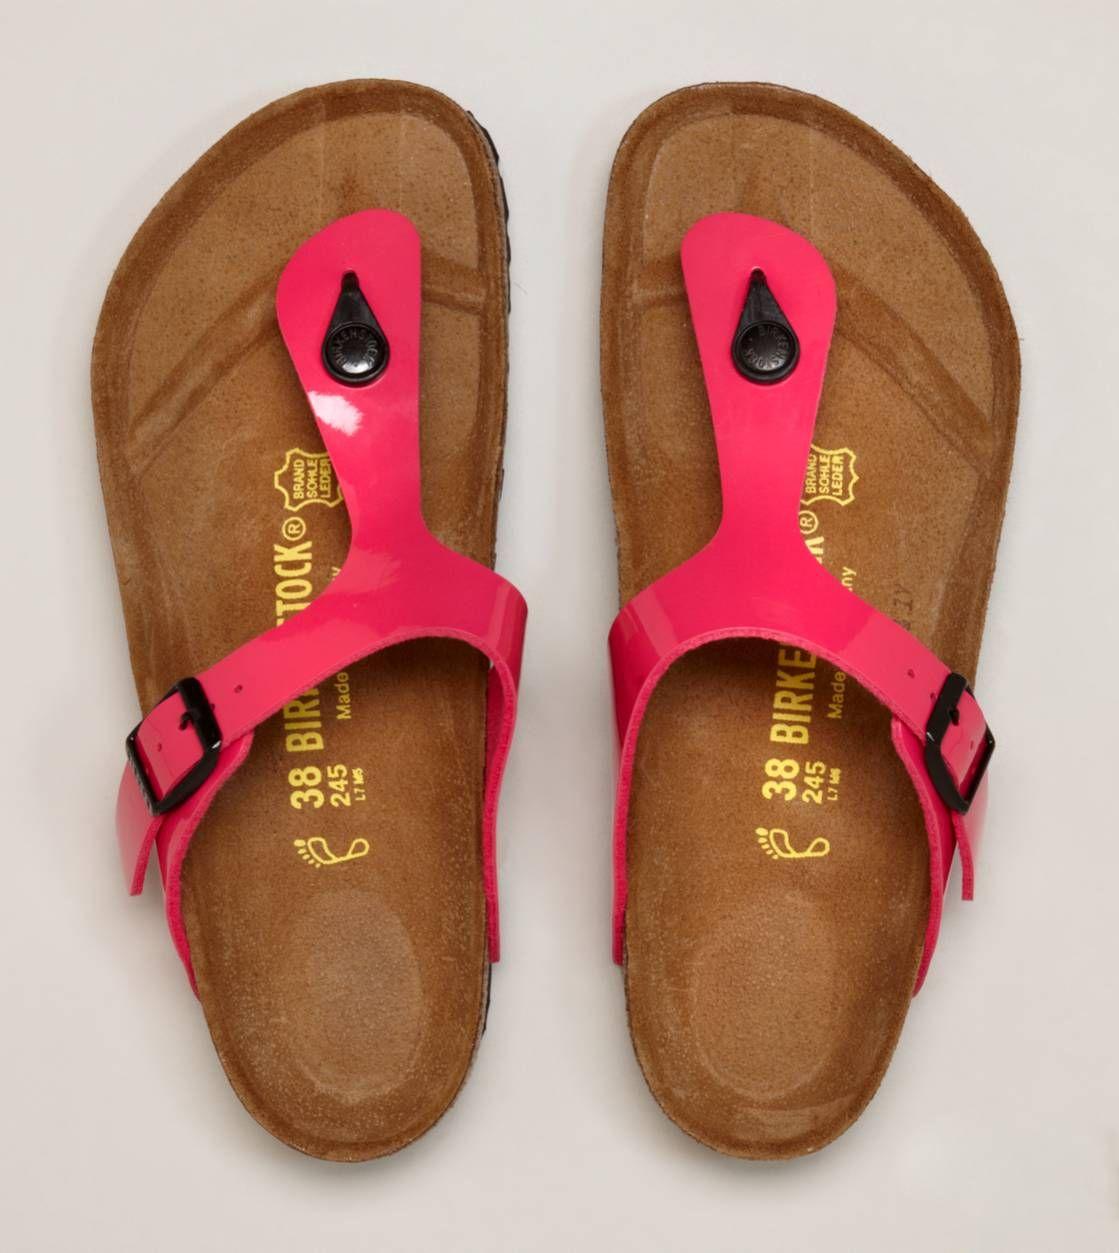 dab4738ef900 Birkenstock Gizeh Sandal- pink. I kinda like these  Lorrie Cerny (and I do  love birkenstocks!)